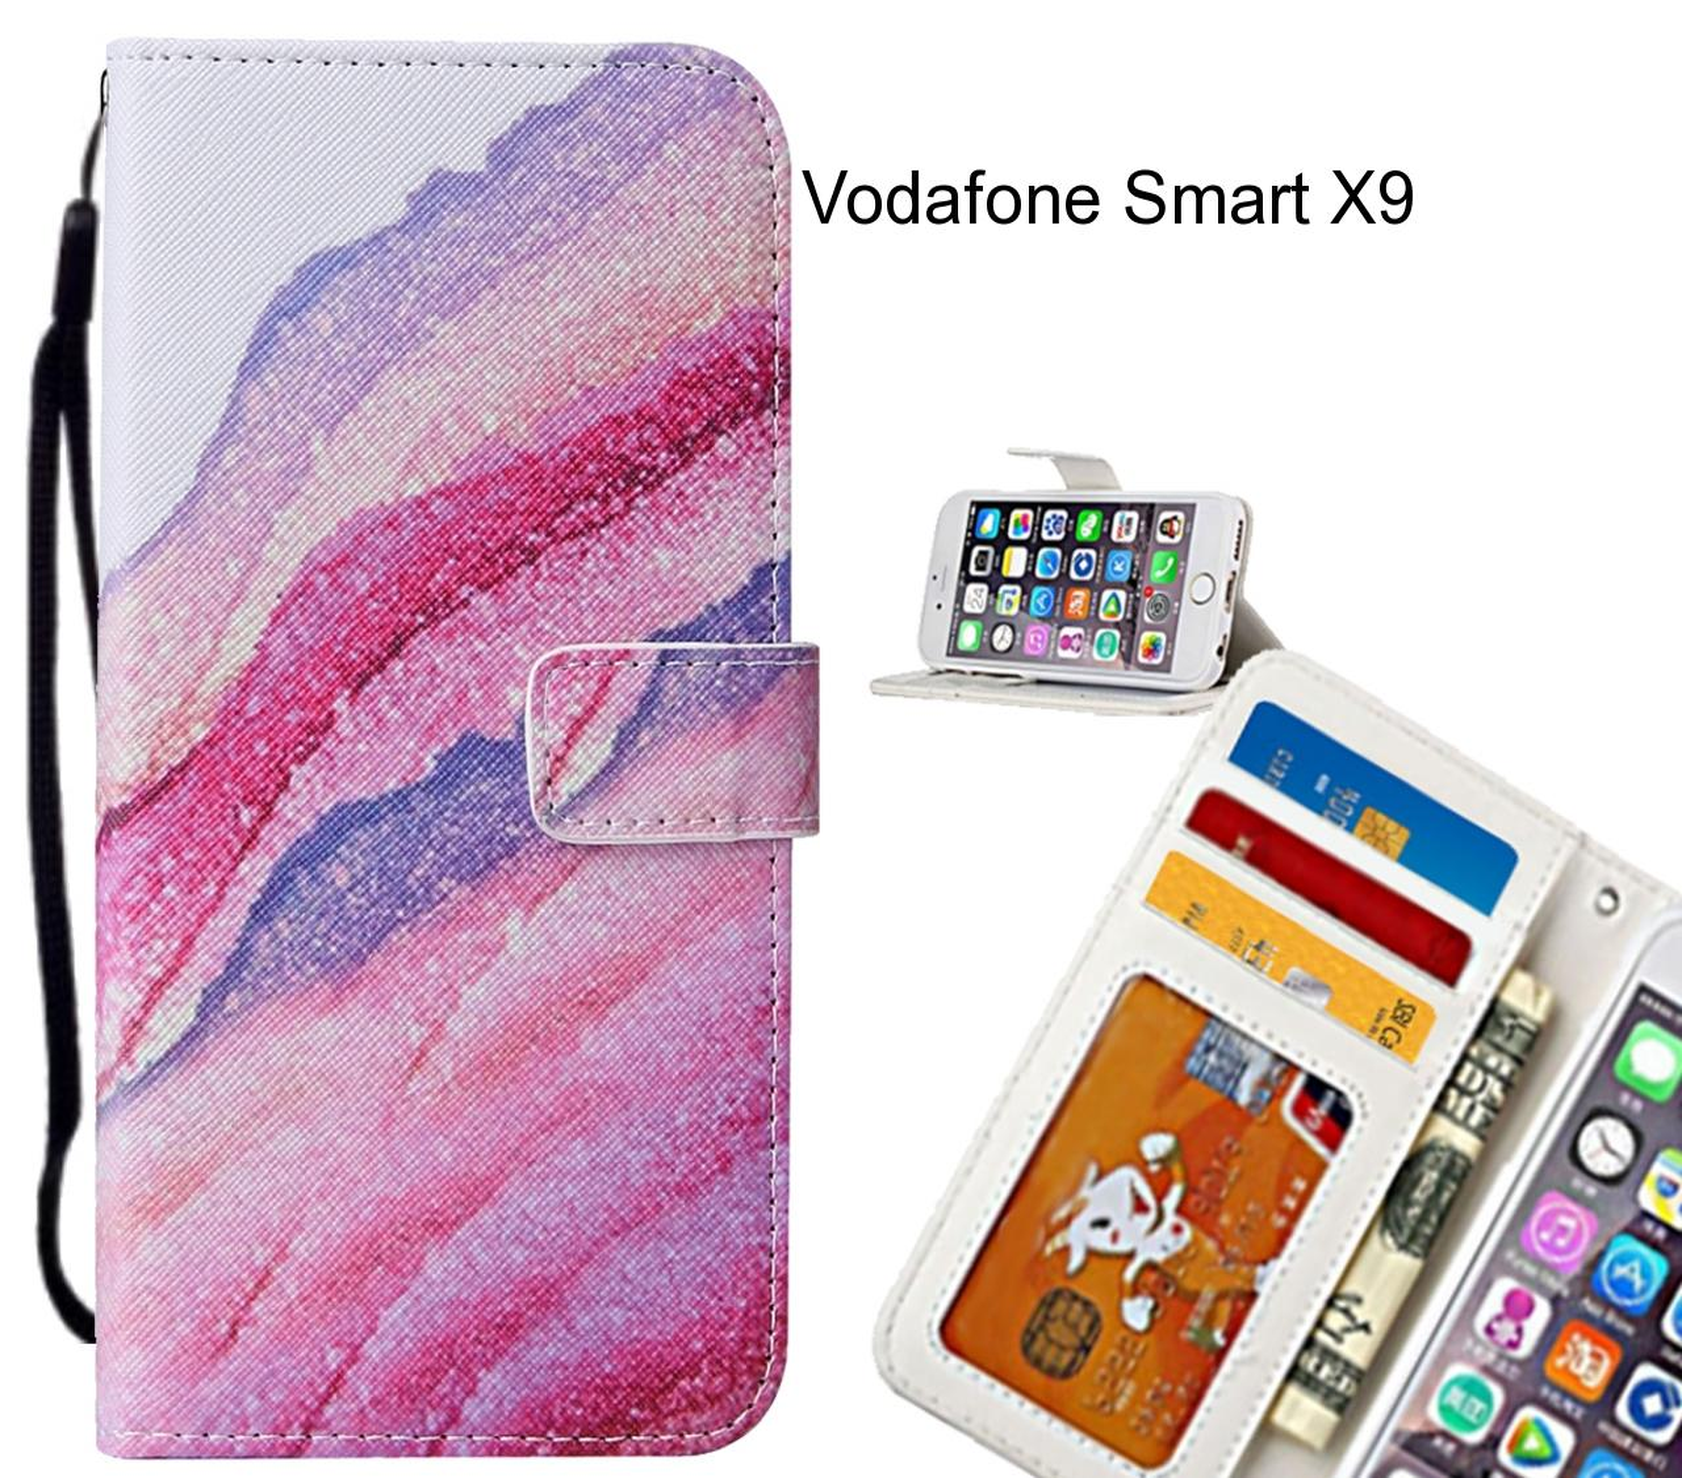 reputable site 5c43d 5f8a5 Vodafone Smart X9